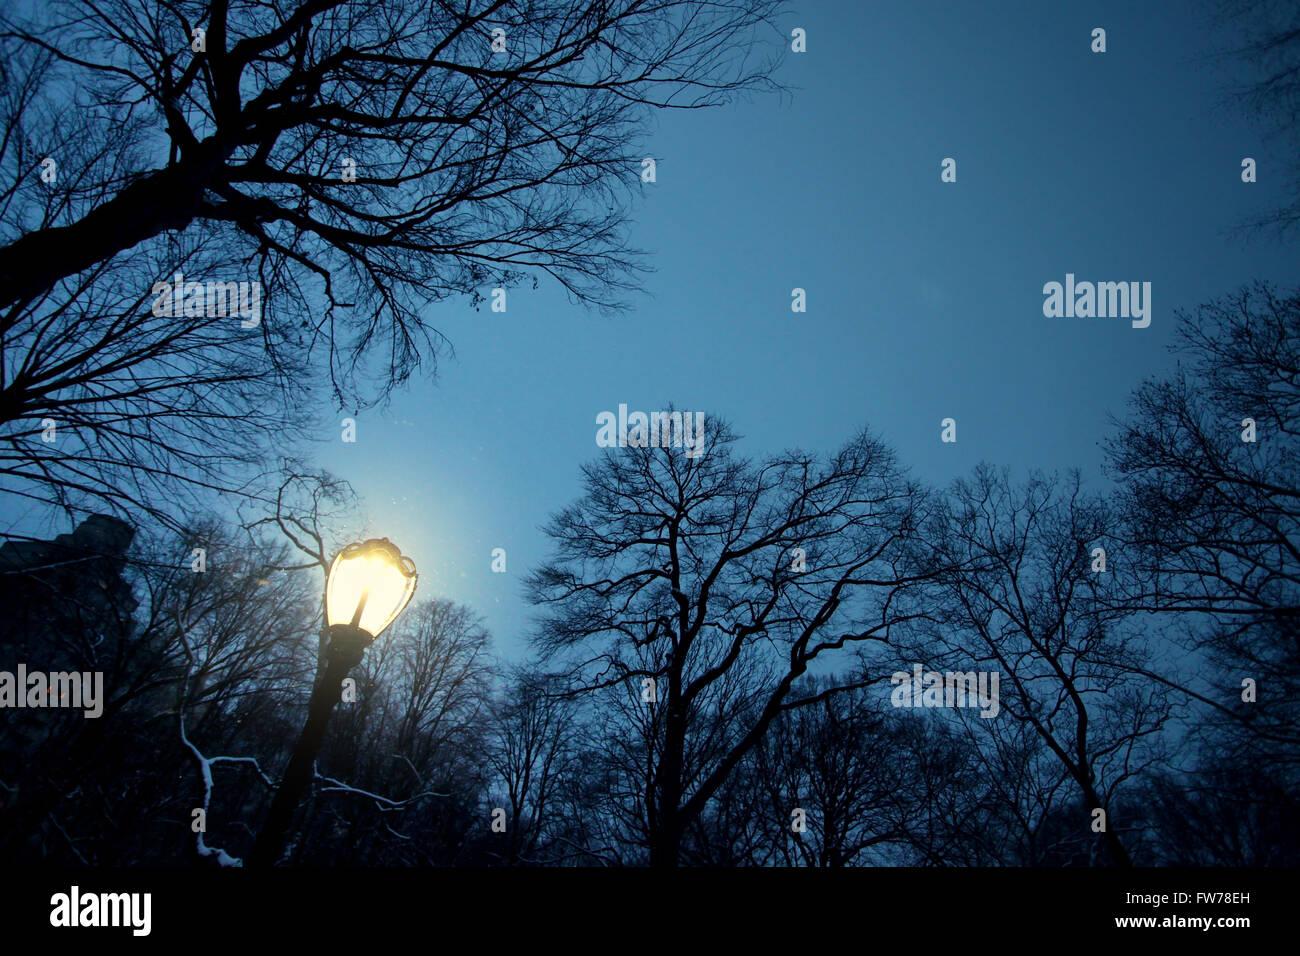 Central Park Himmel bei Nacht Stockfoto